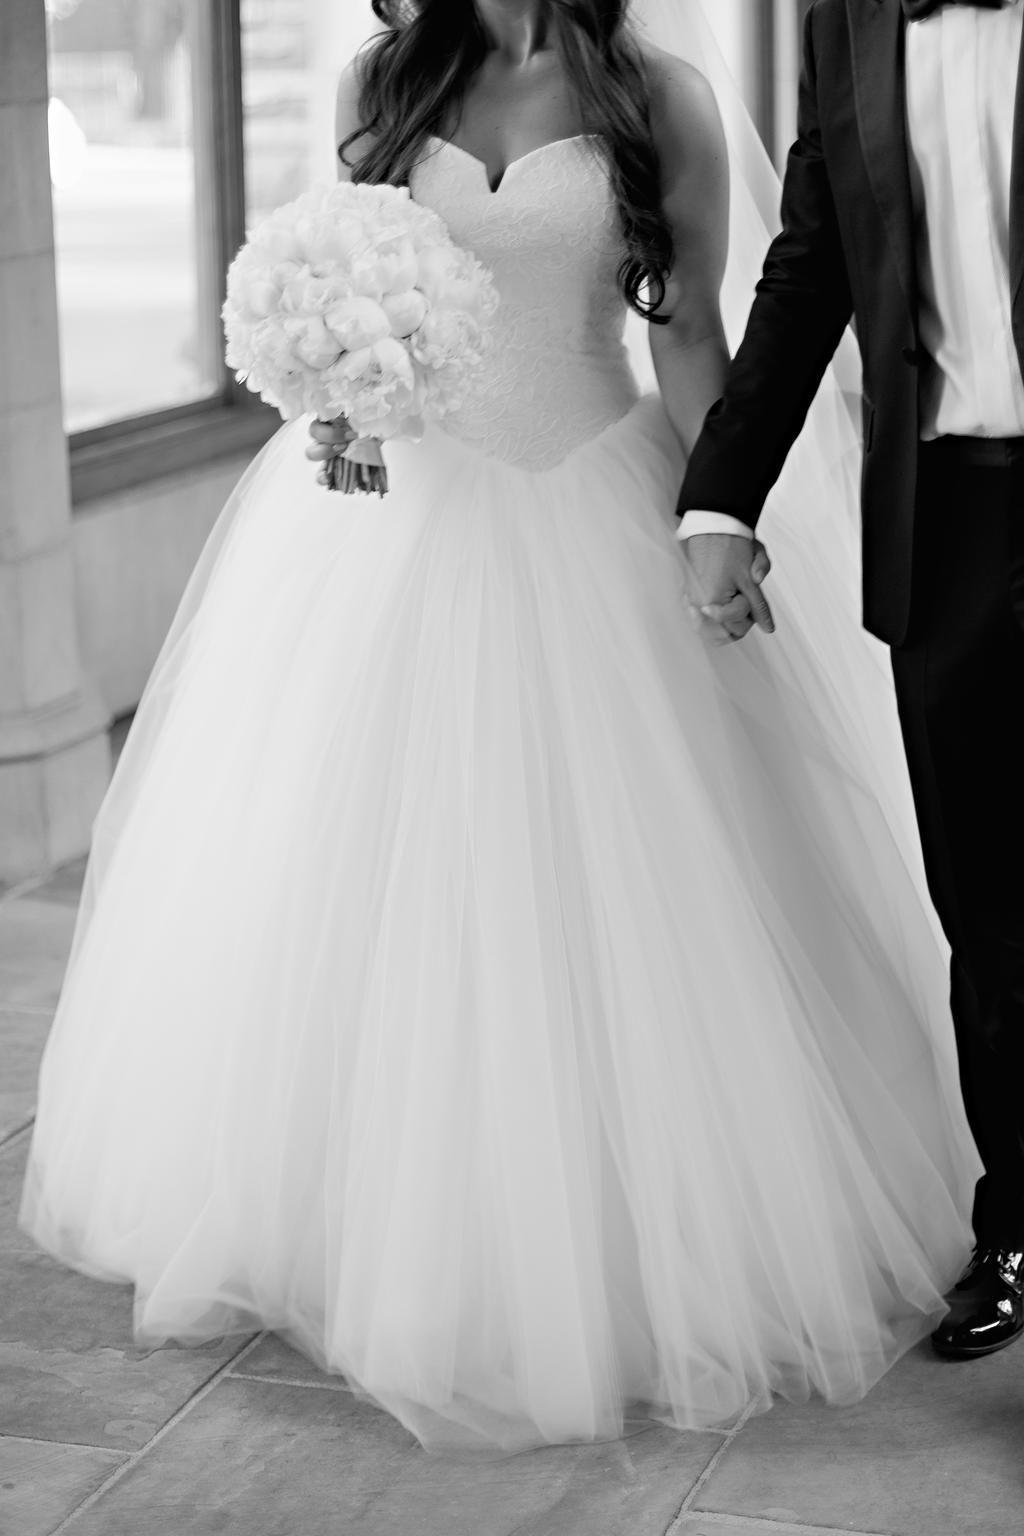 Vera Bride Wars 3 999 Size 10 Used Wedding Dresses